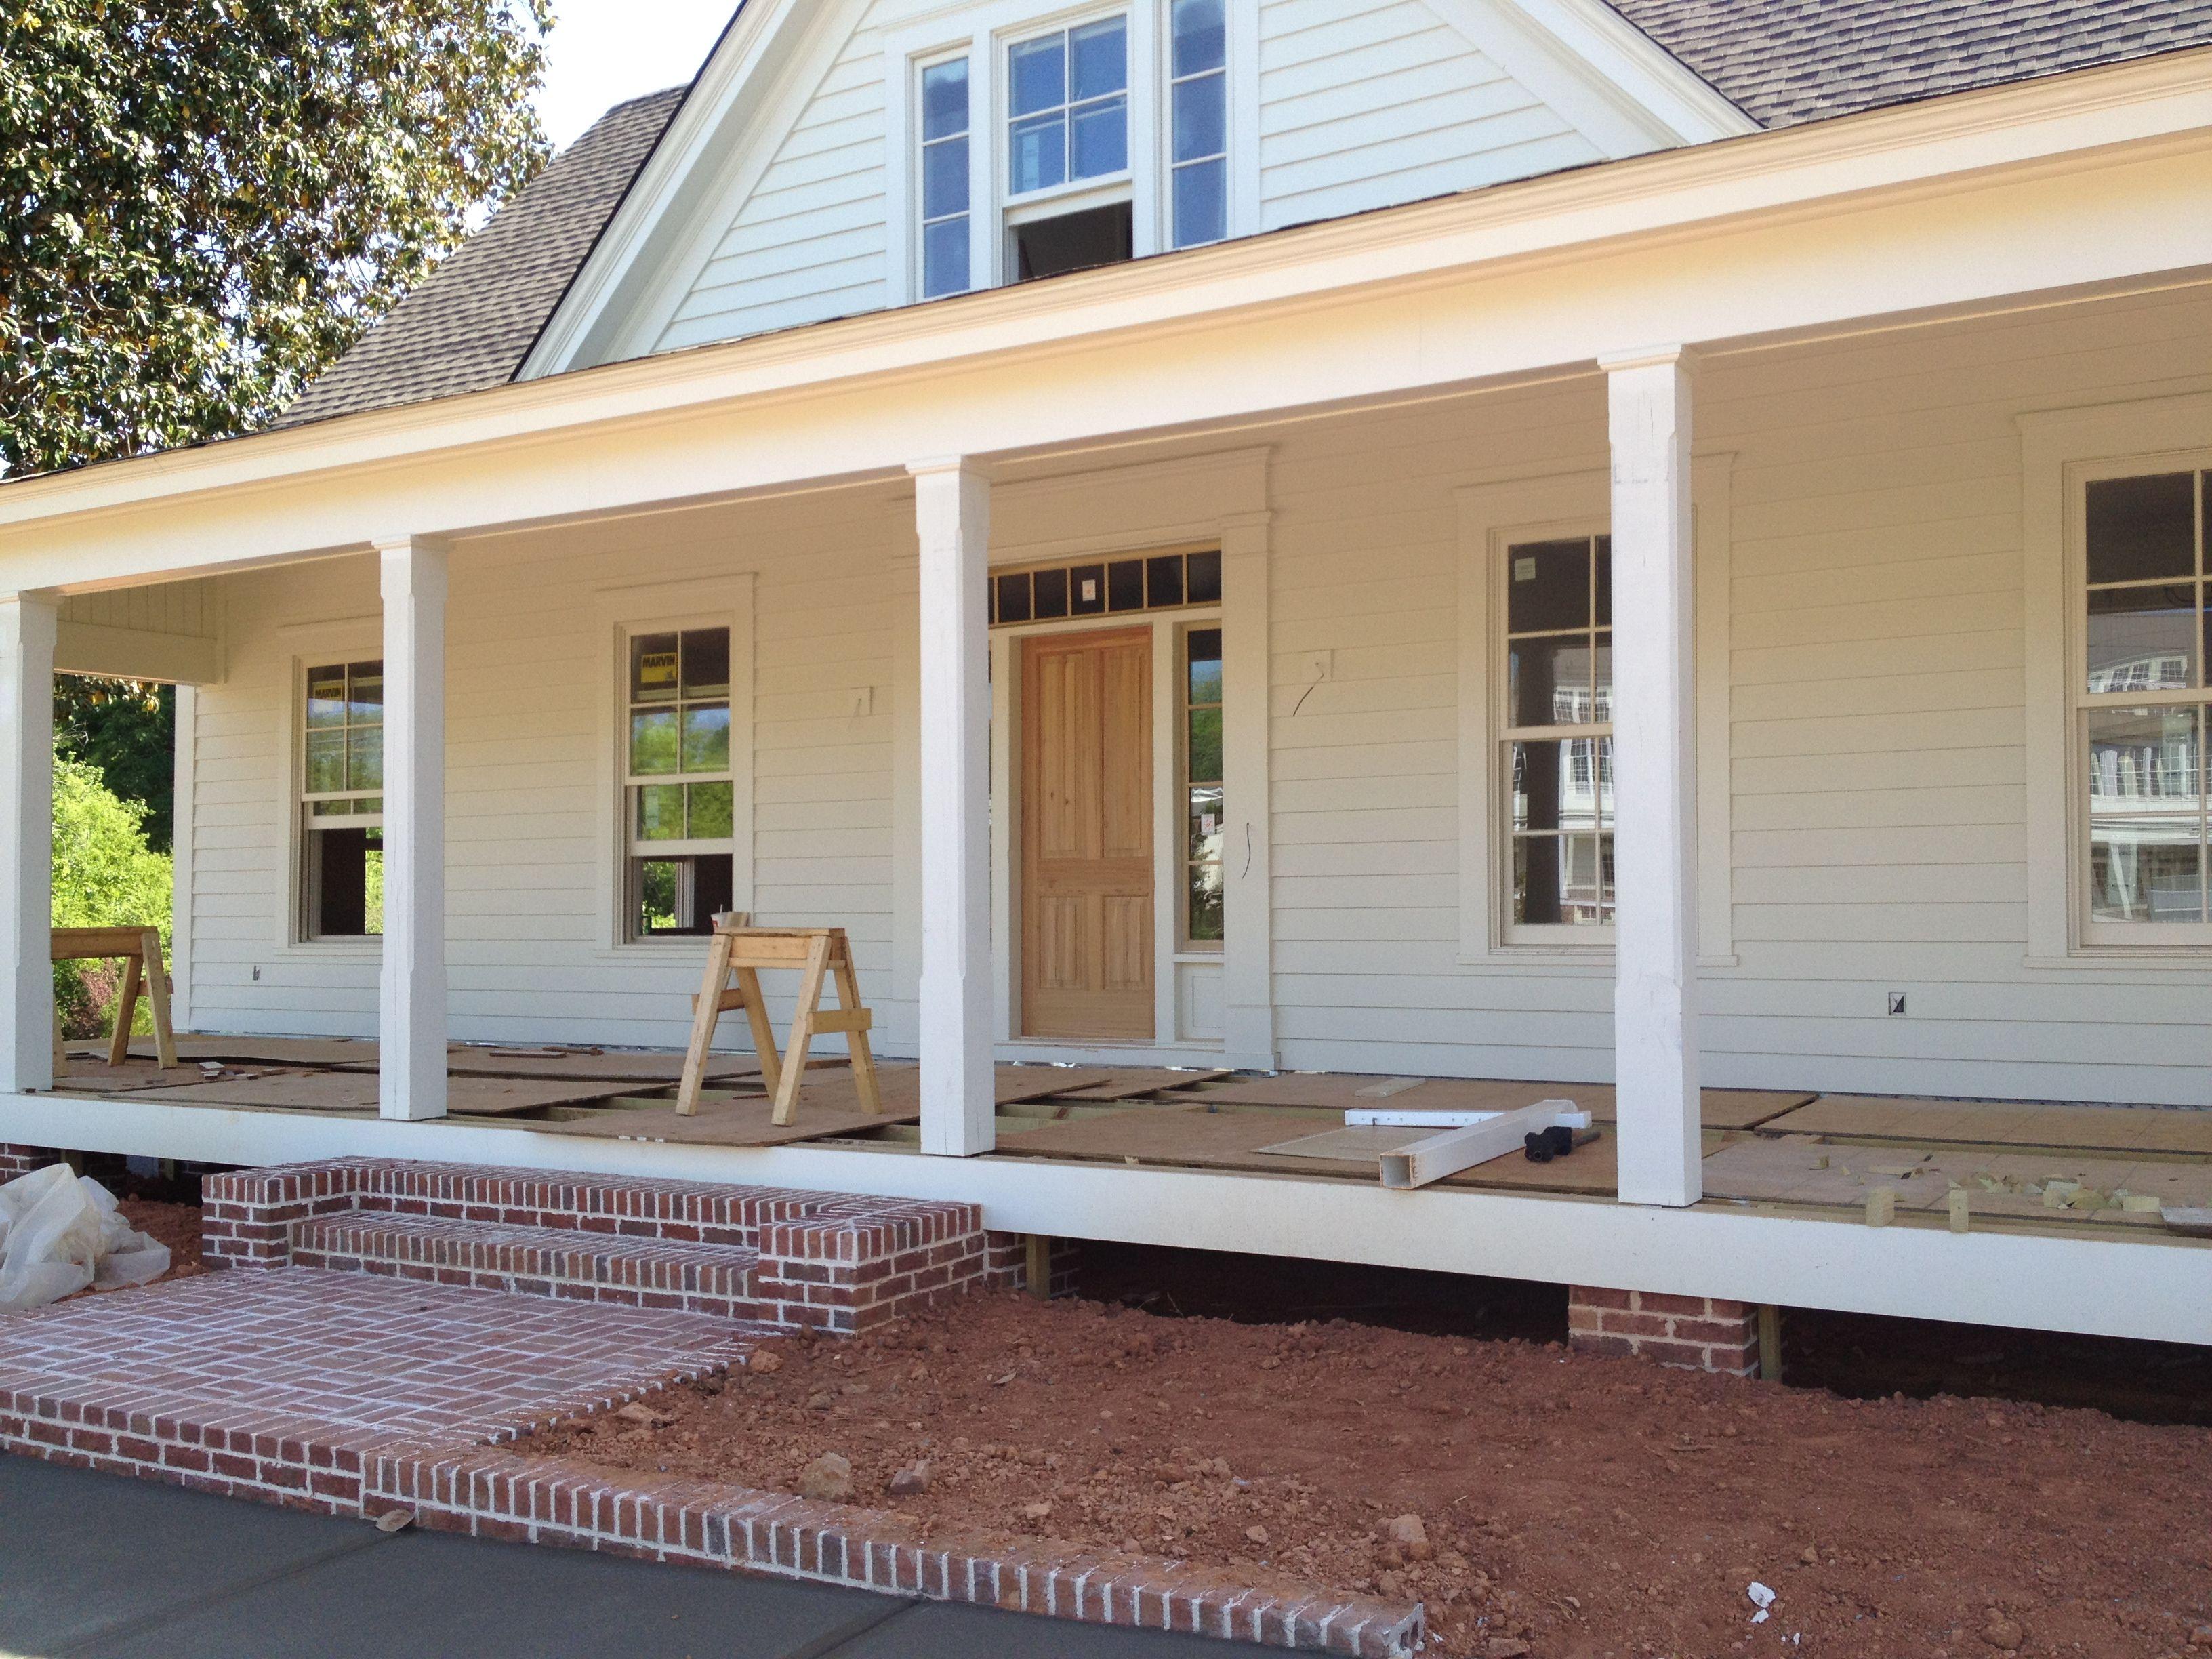 Southern Living Idea House 2012 Like The Gable Above